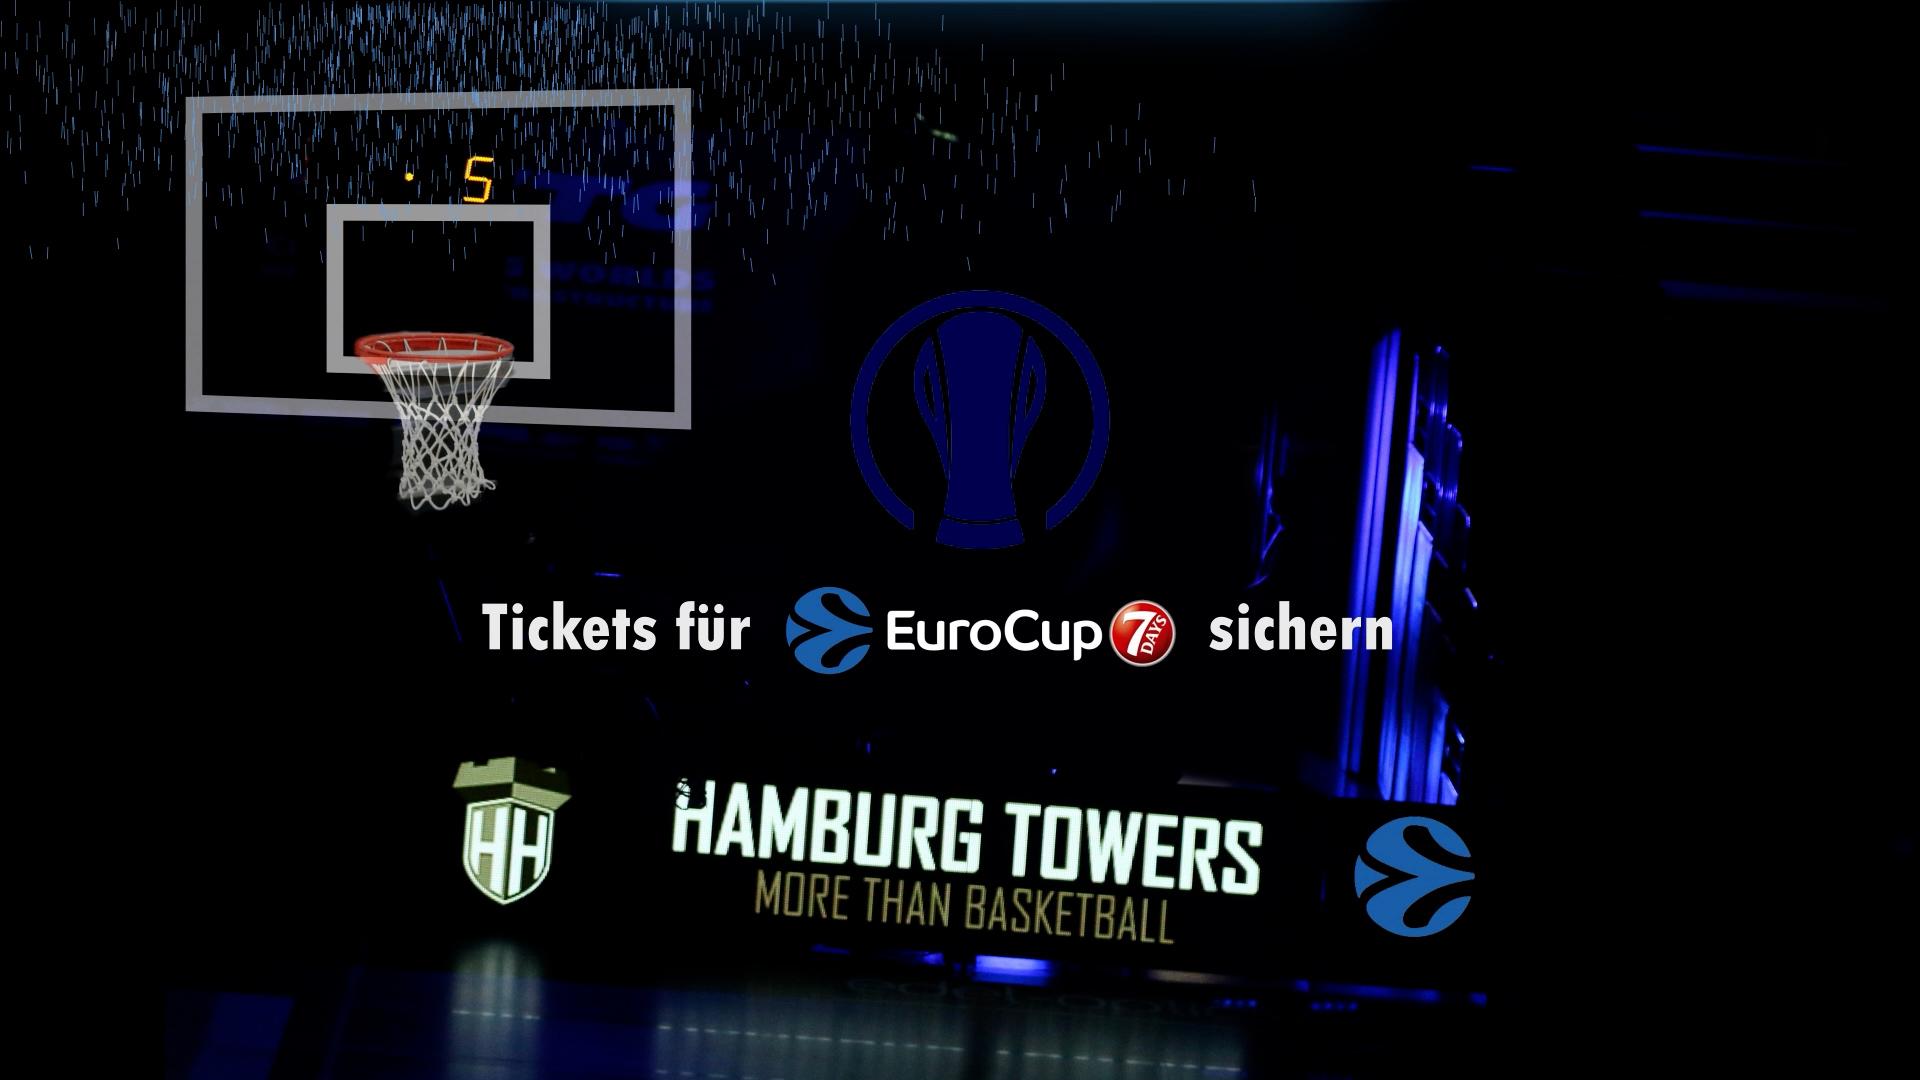 Hamburg Towers Eurocup Tickets